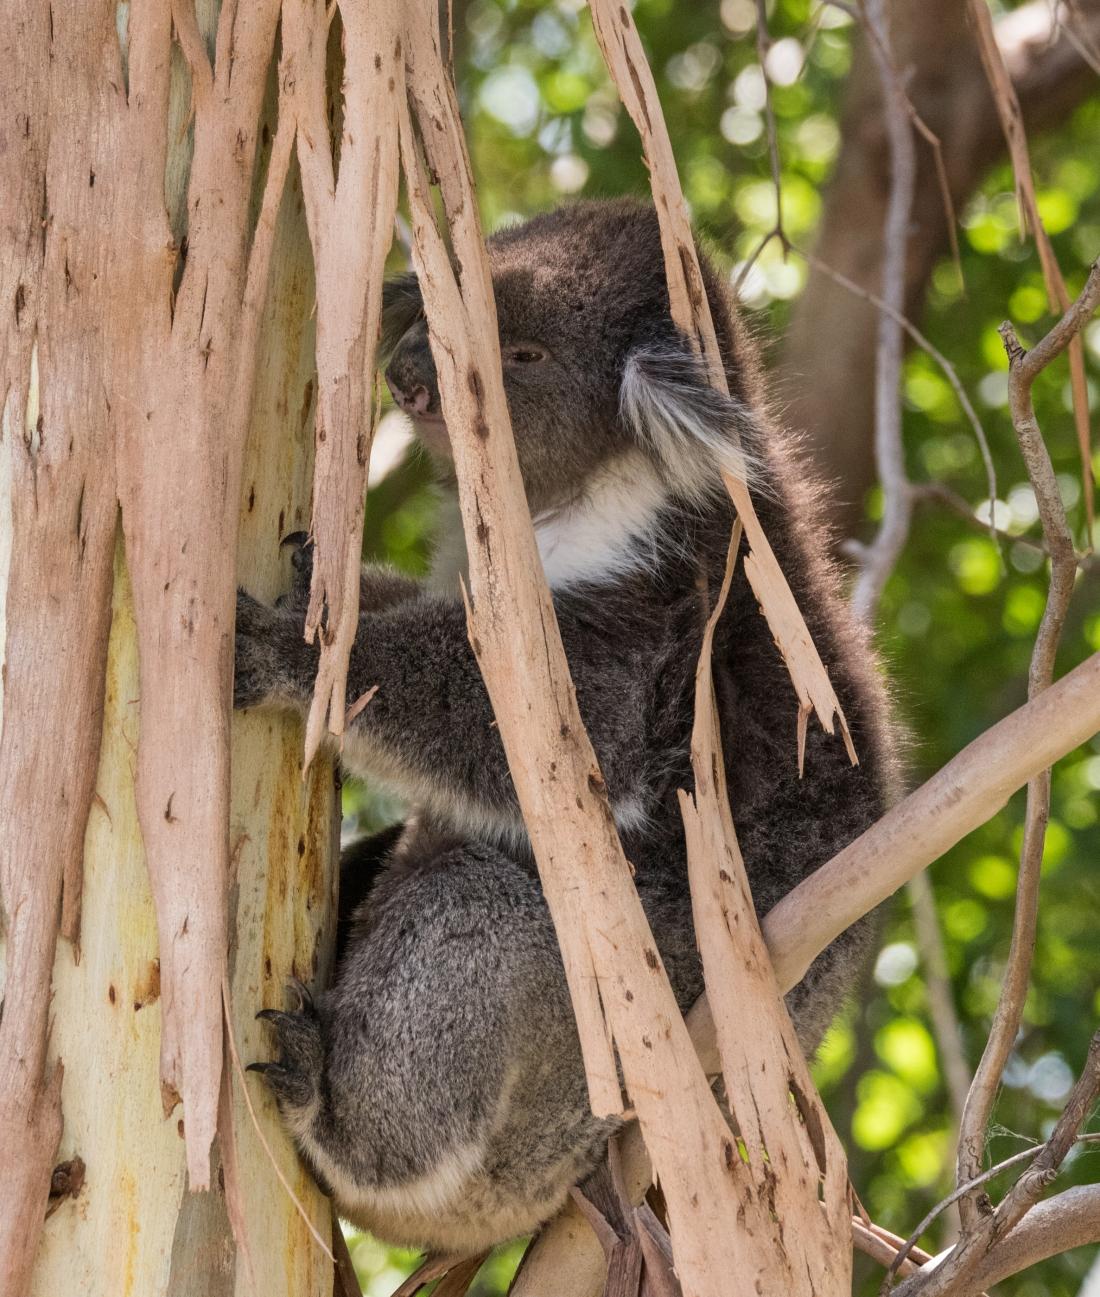 John Langmead_George & koala AB_1346_20180106_Online